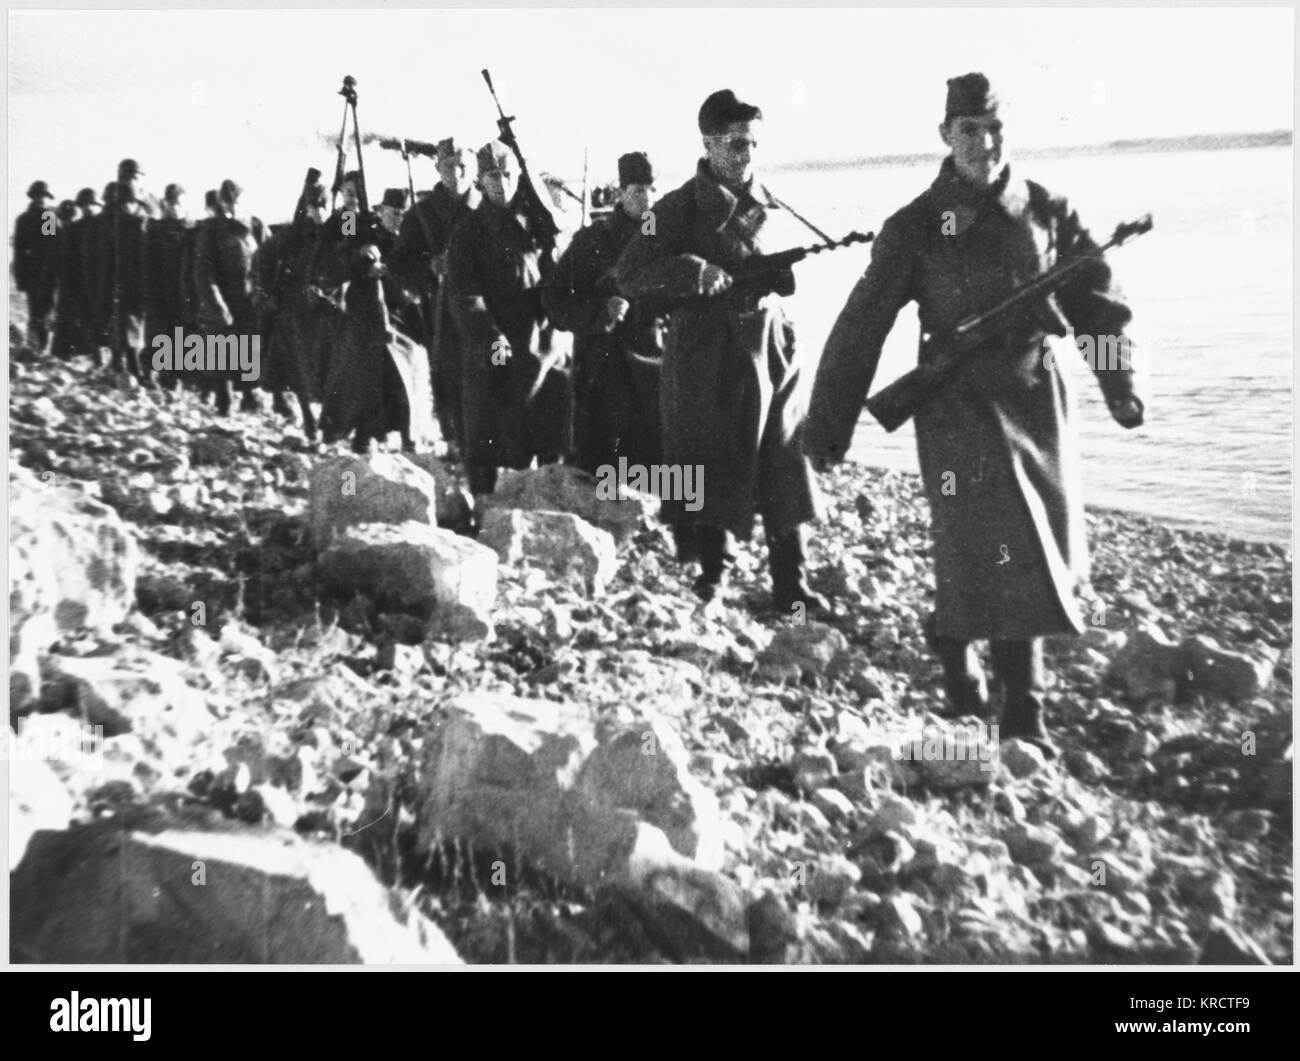 Re-inforcements arrive having crossed the Volga River. Date: 1942-43 - Stock Image